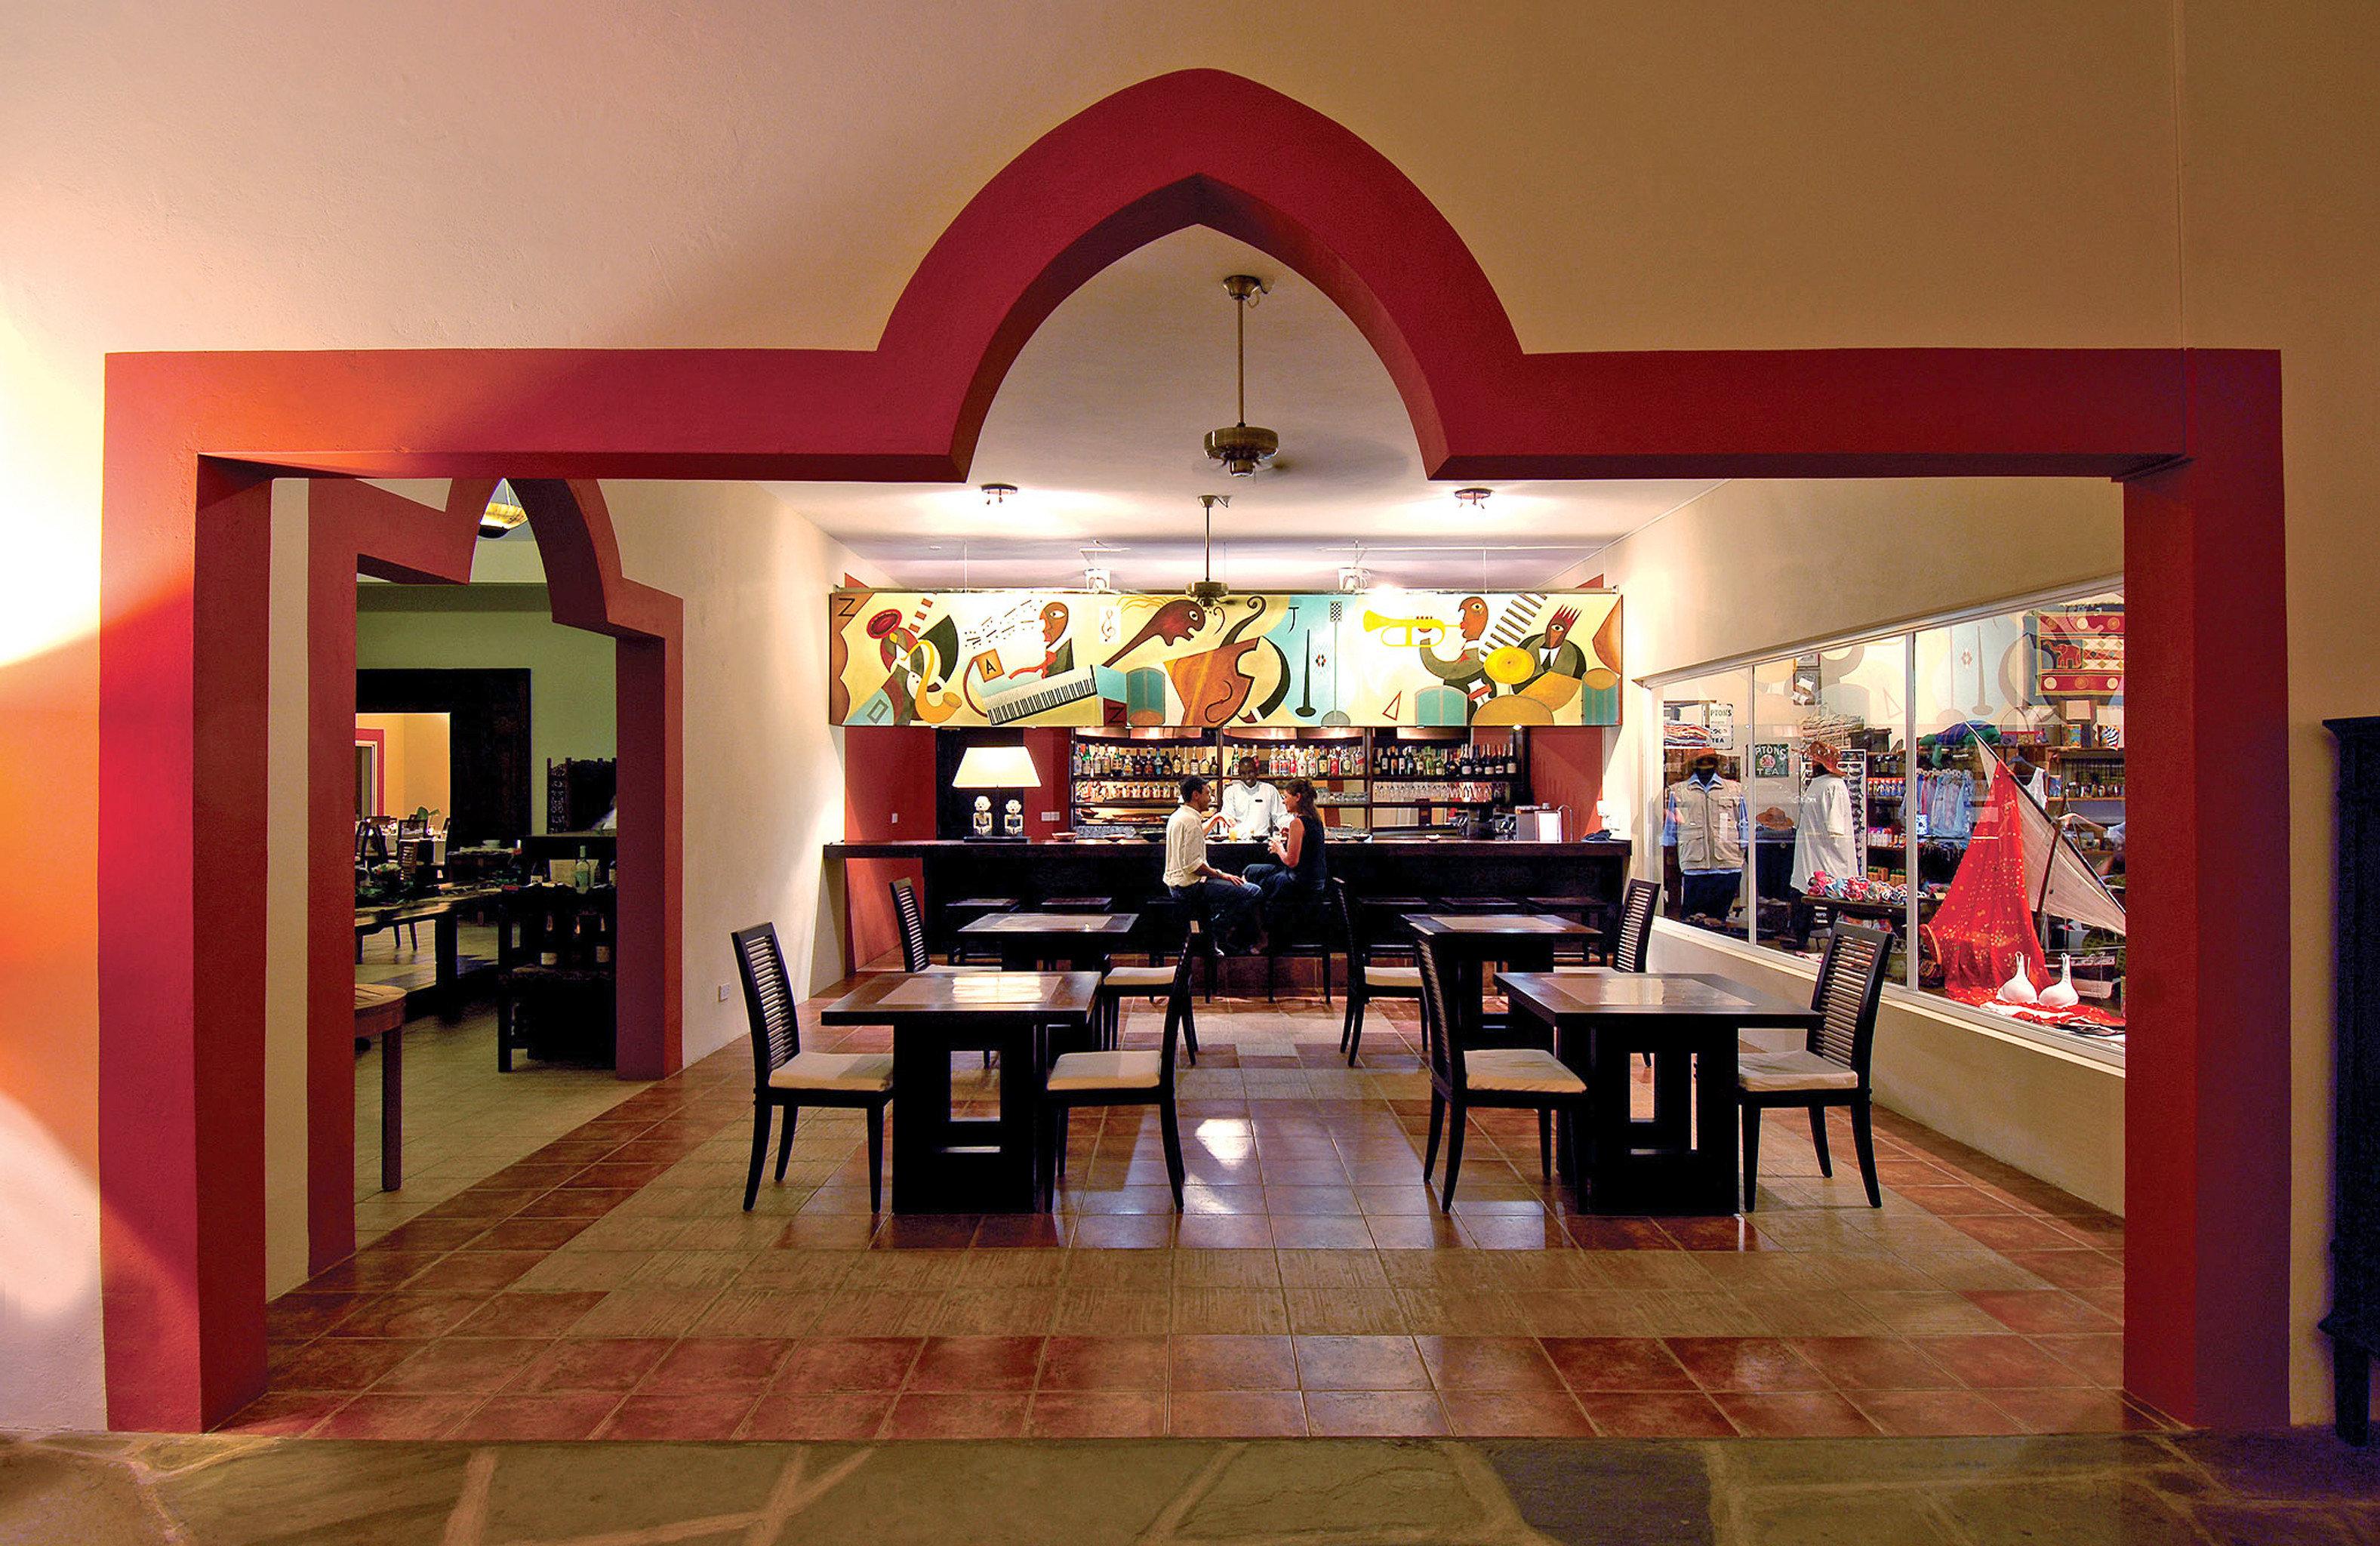 Bar Dining Drink Eat Resort Shop recreation room home living room Lobby